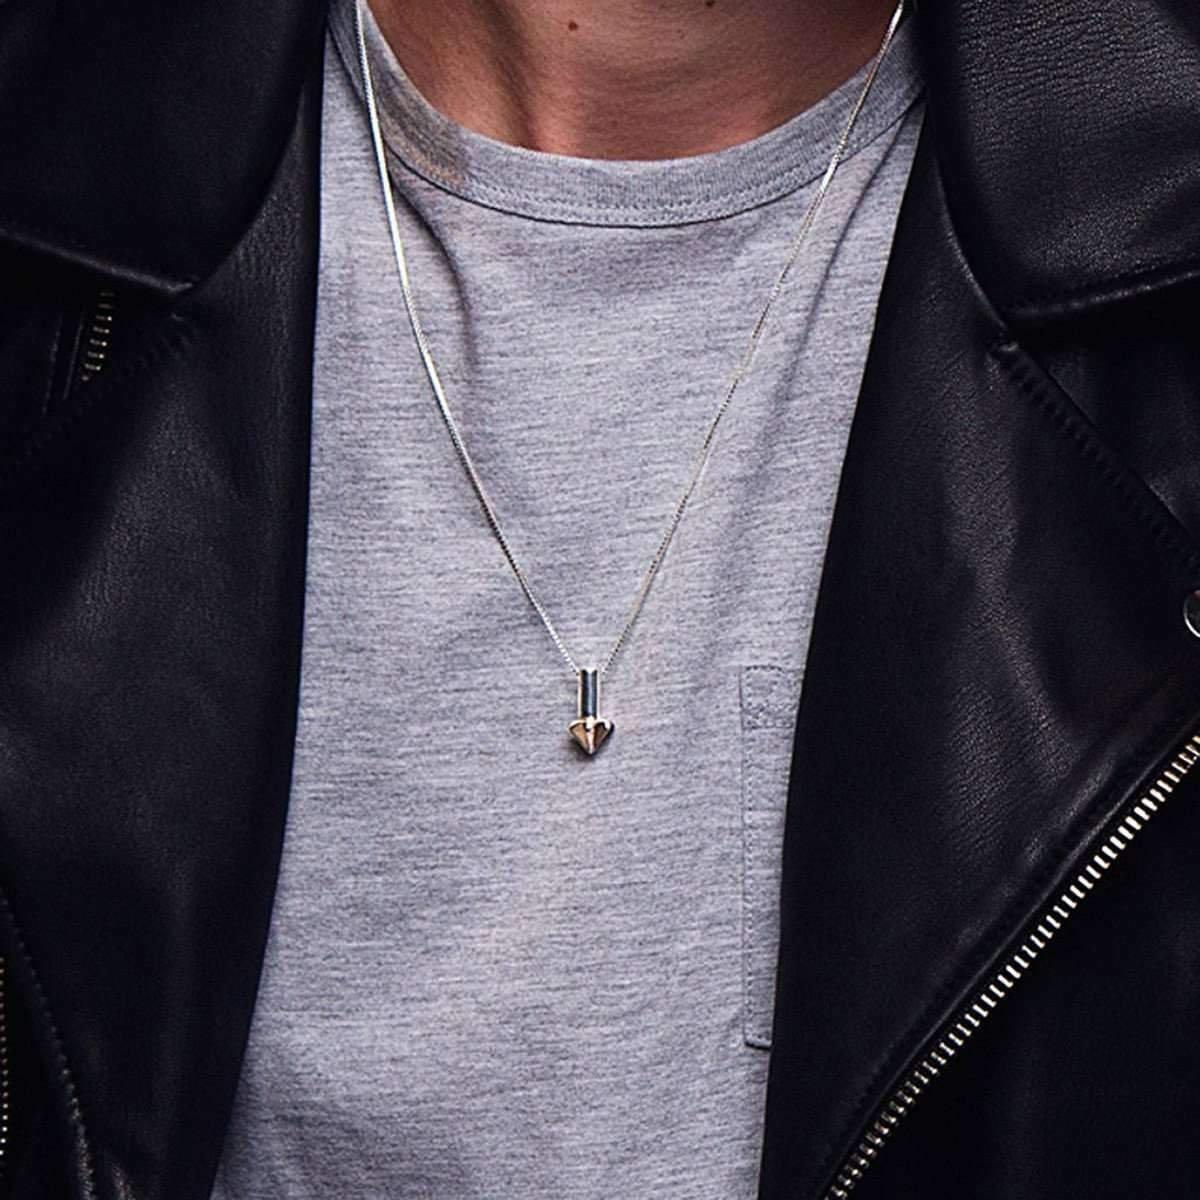 mens chain necklaces